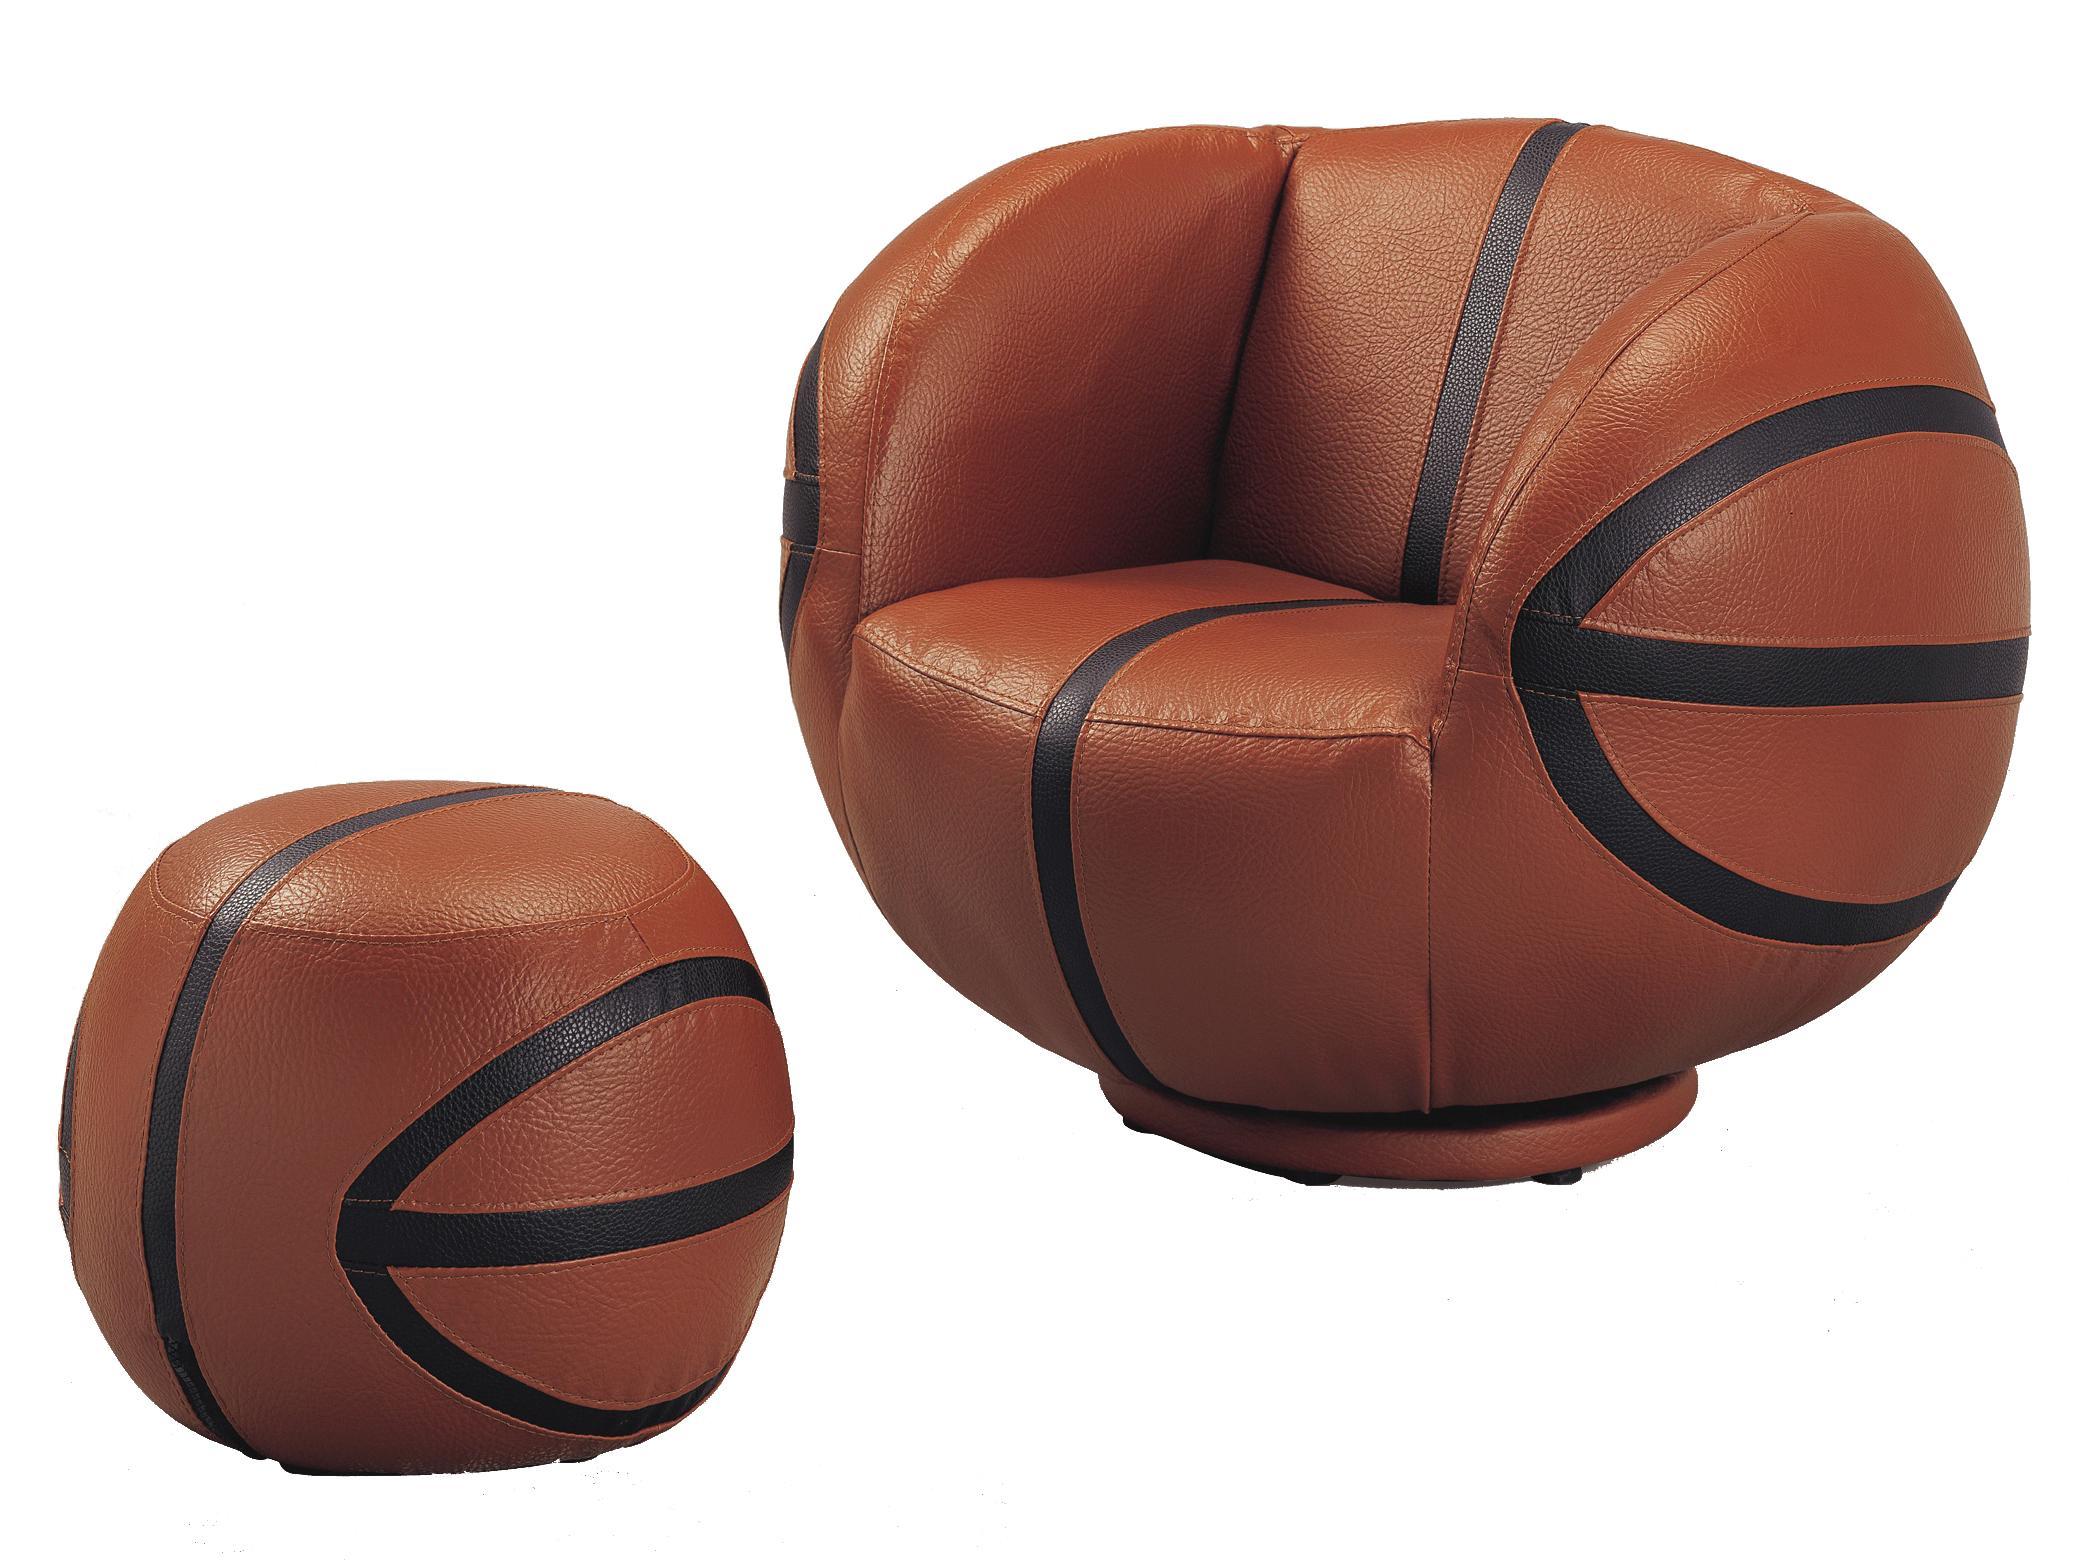 Kids Sport Chairs Basketball Swivel Chair U0026 Ottoman By Crown Mark